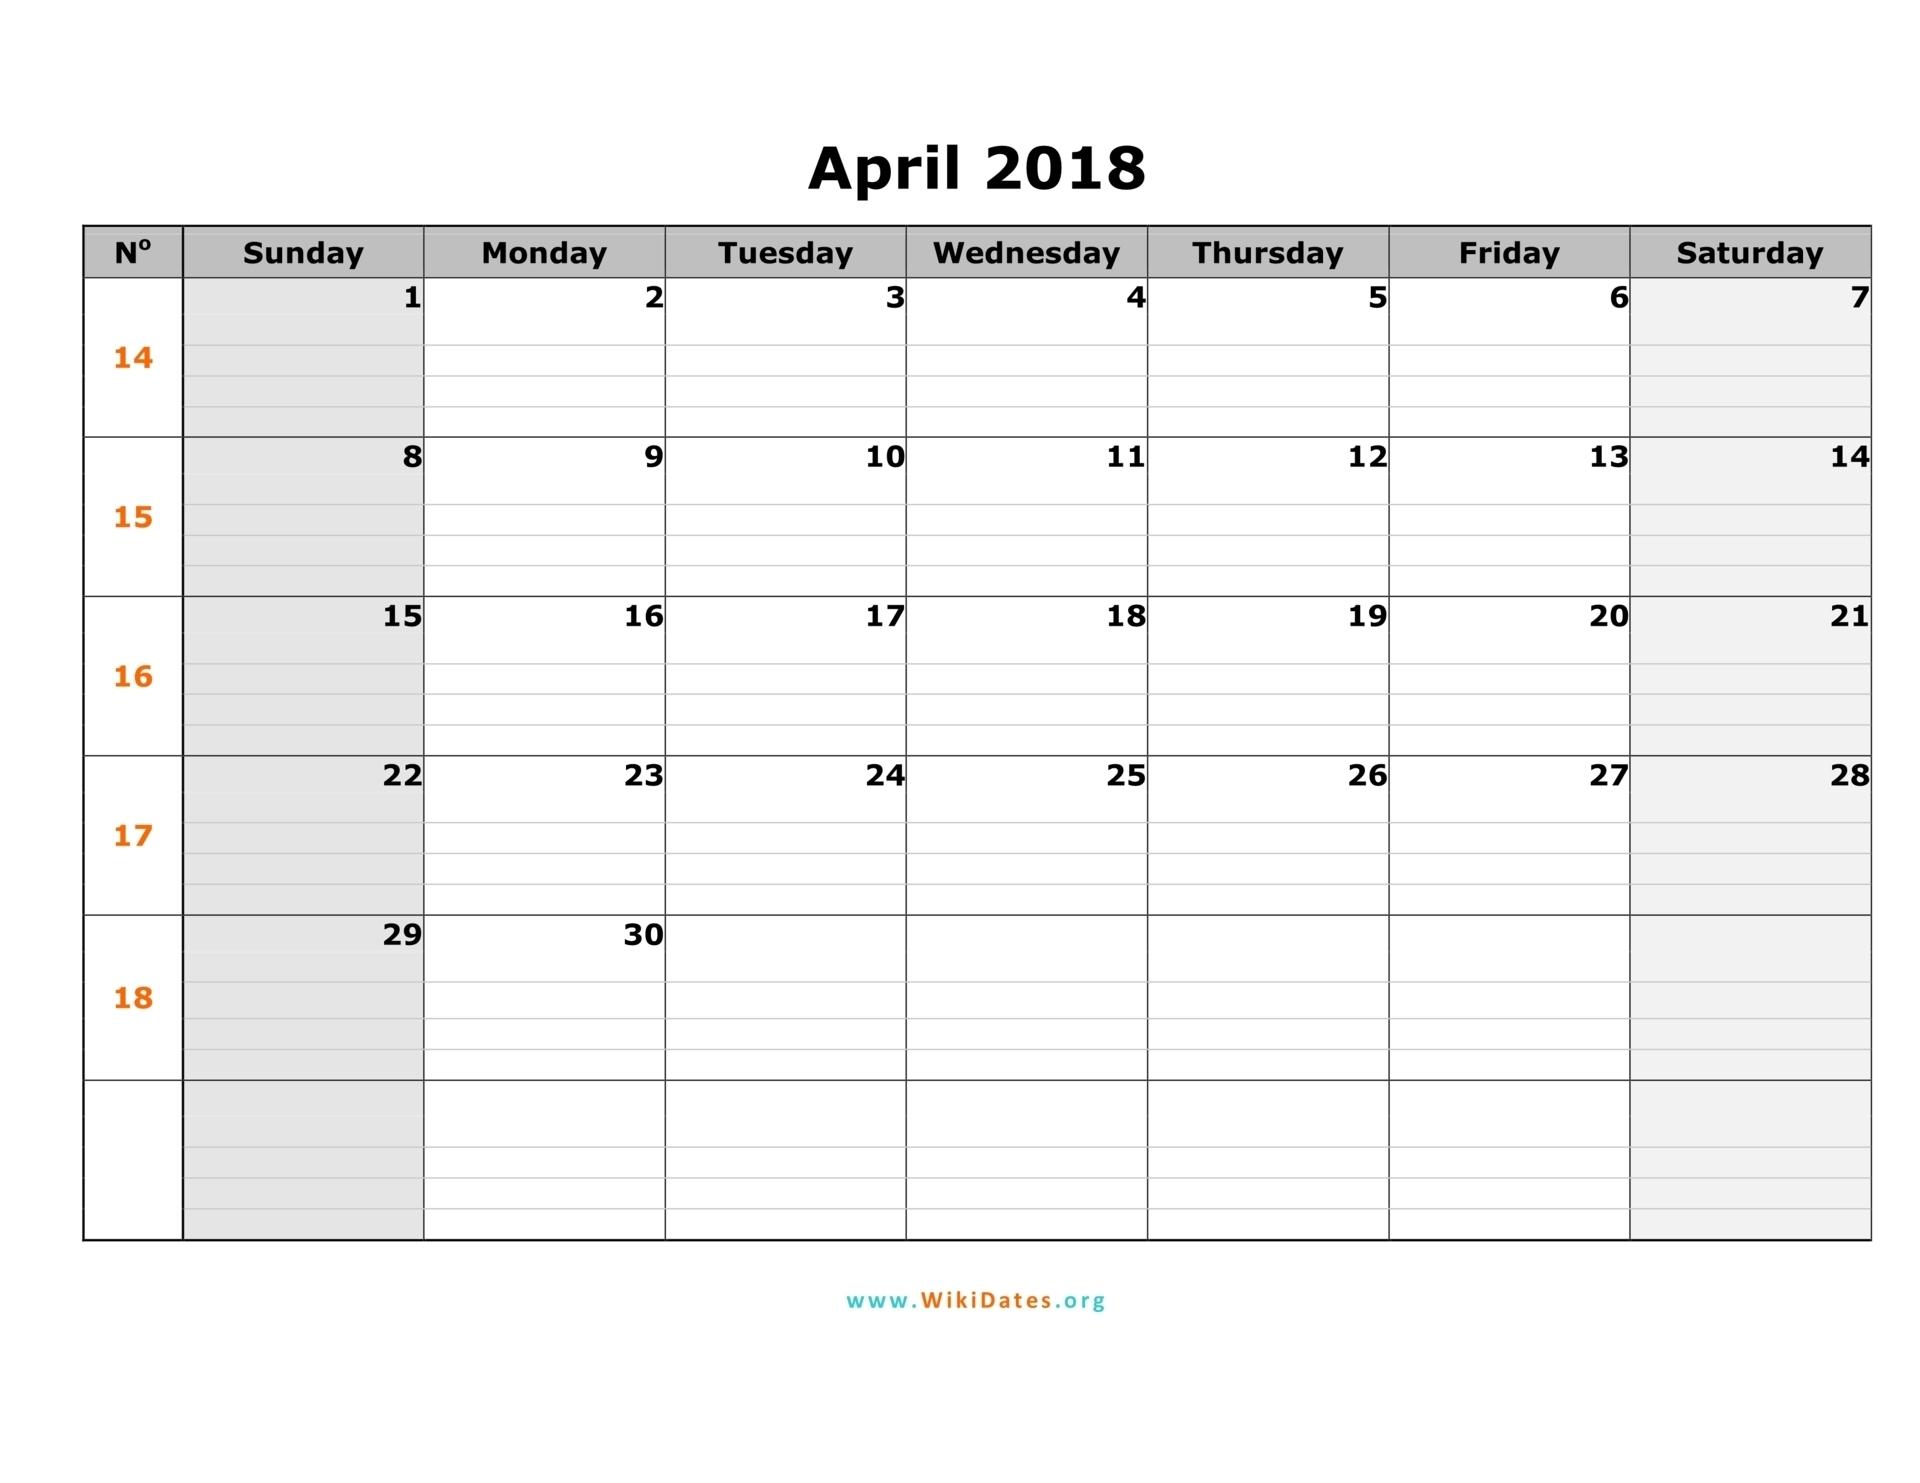 018 Two Week Calendar Template April Sunday Stupendous Ideas Excel regarding Print A Two Week Calendar